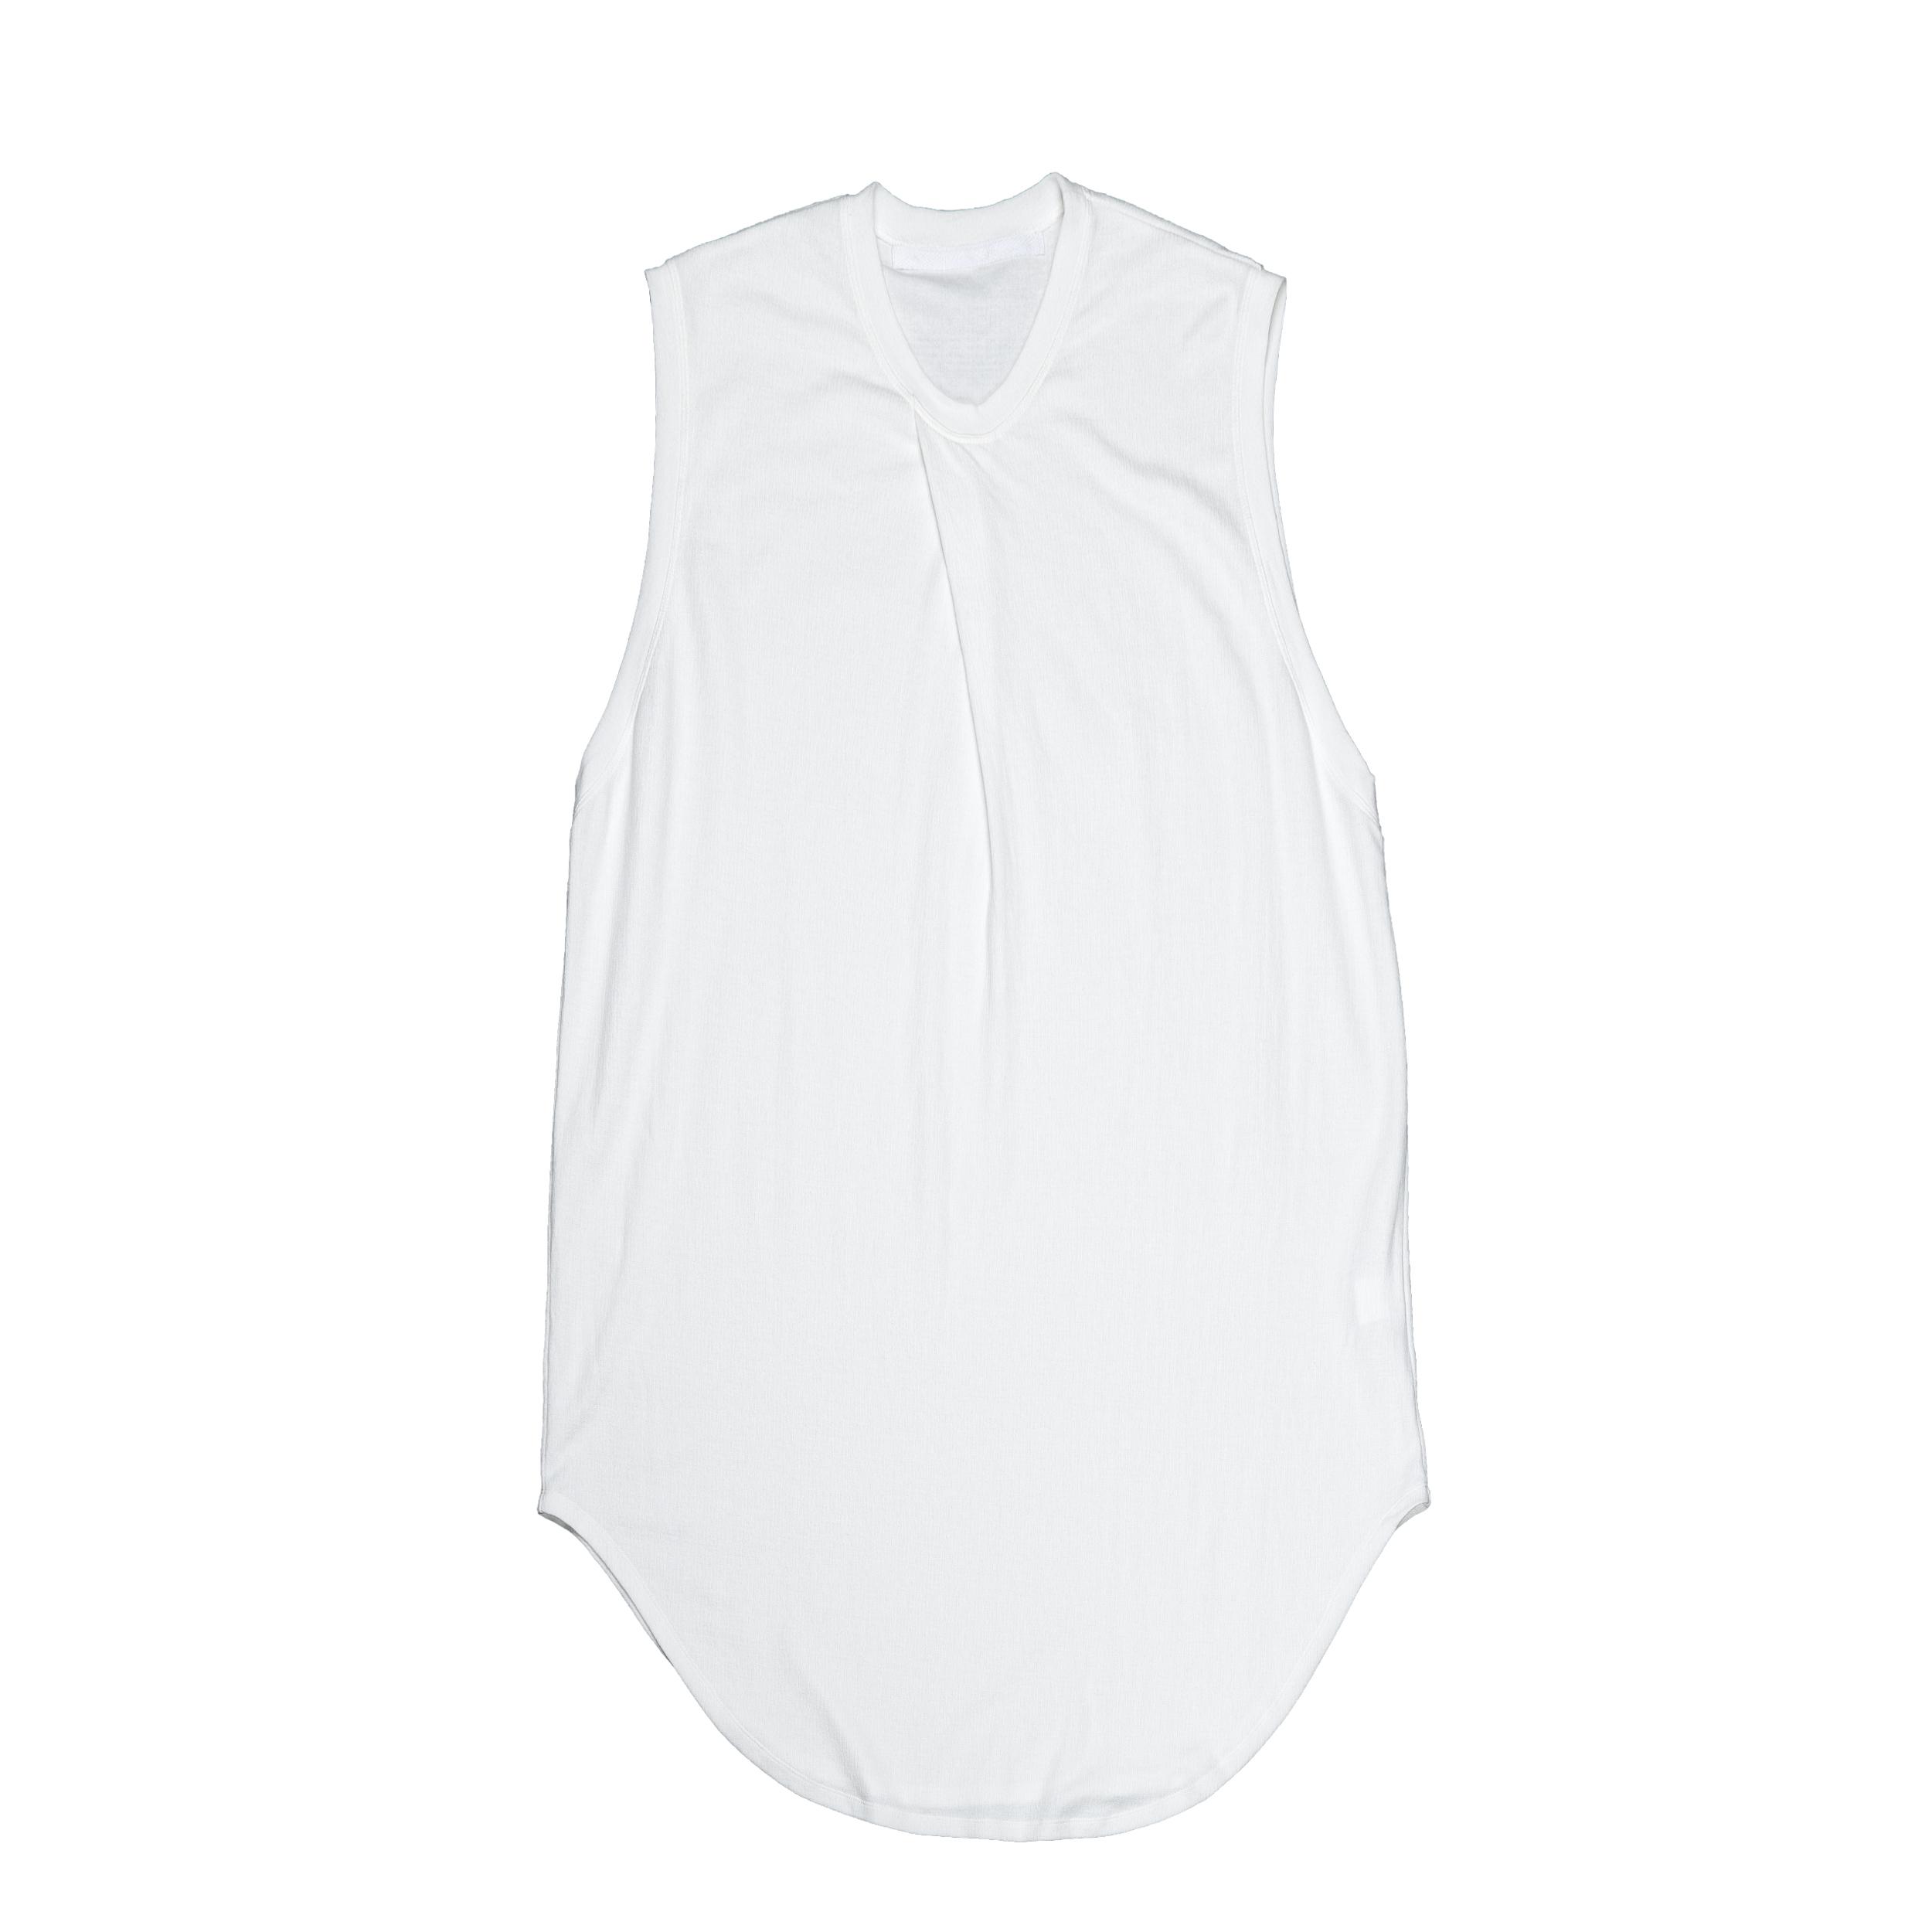 667CUM4-WHITE / タックドノースリーブシャツ